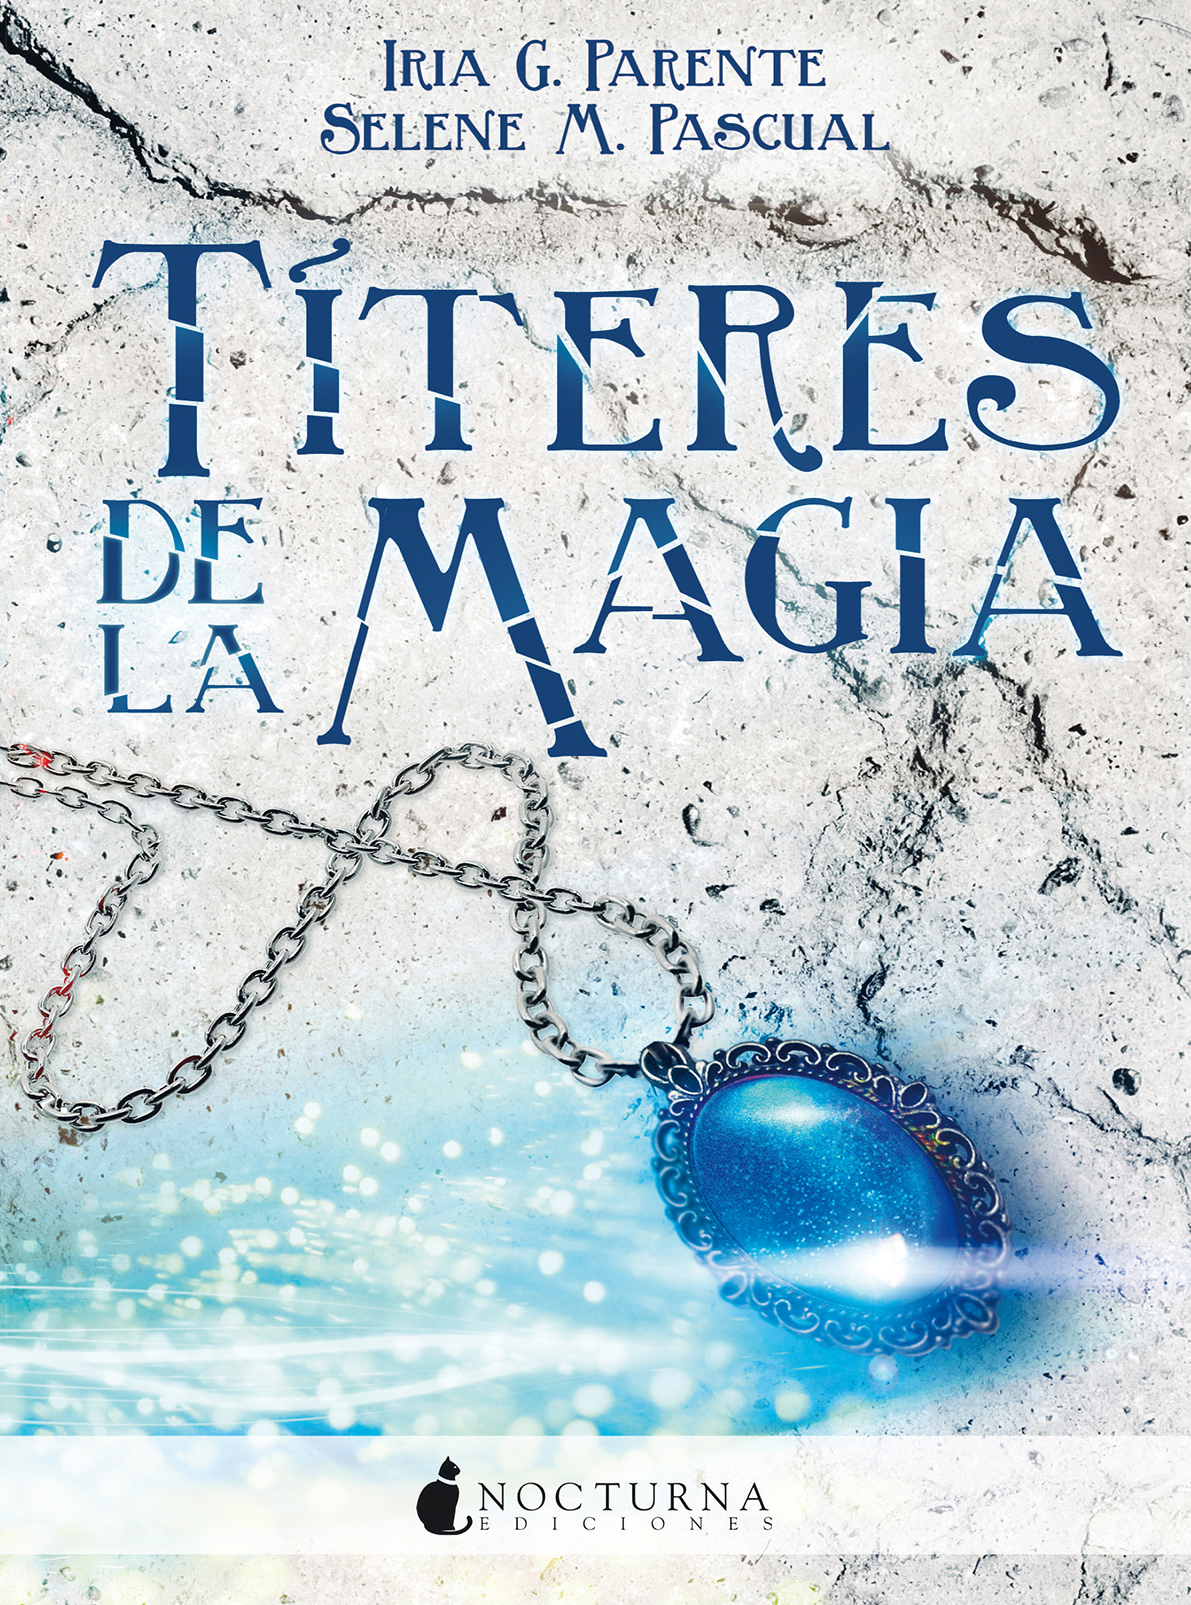 Titeres de la Magia - Iria G. Parente y Selena M. Pascual Portada